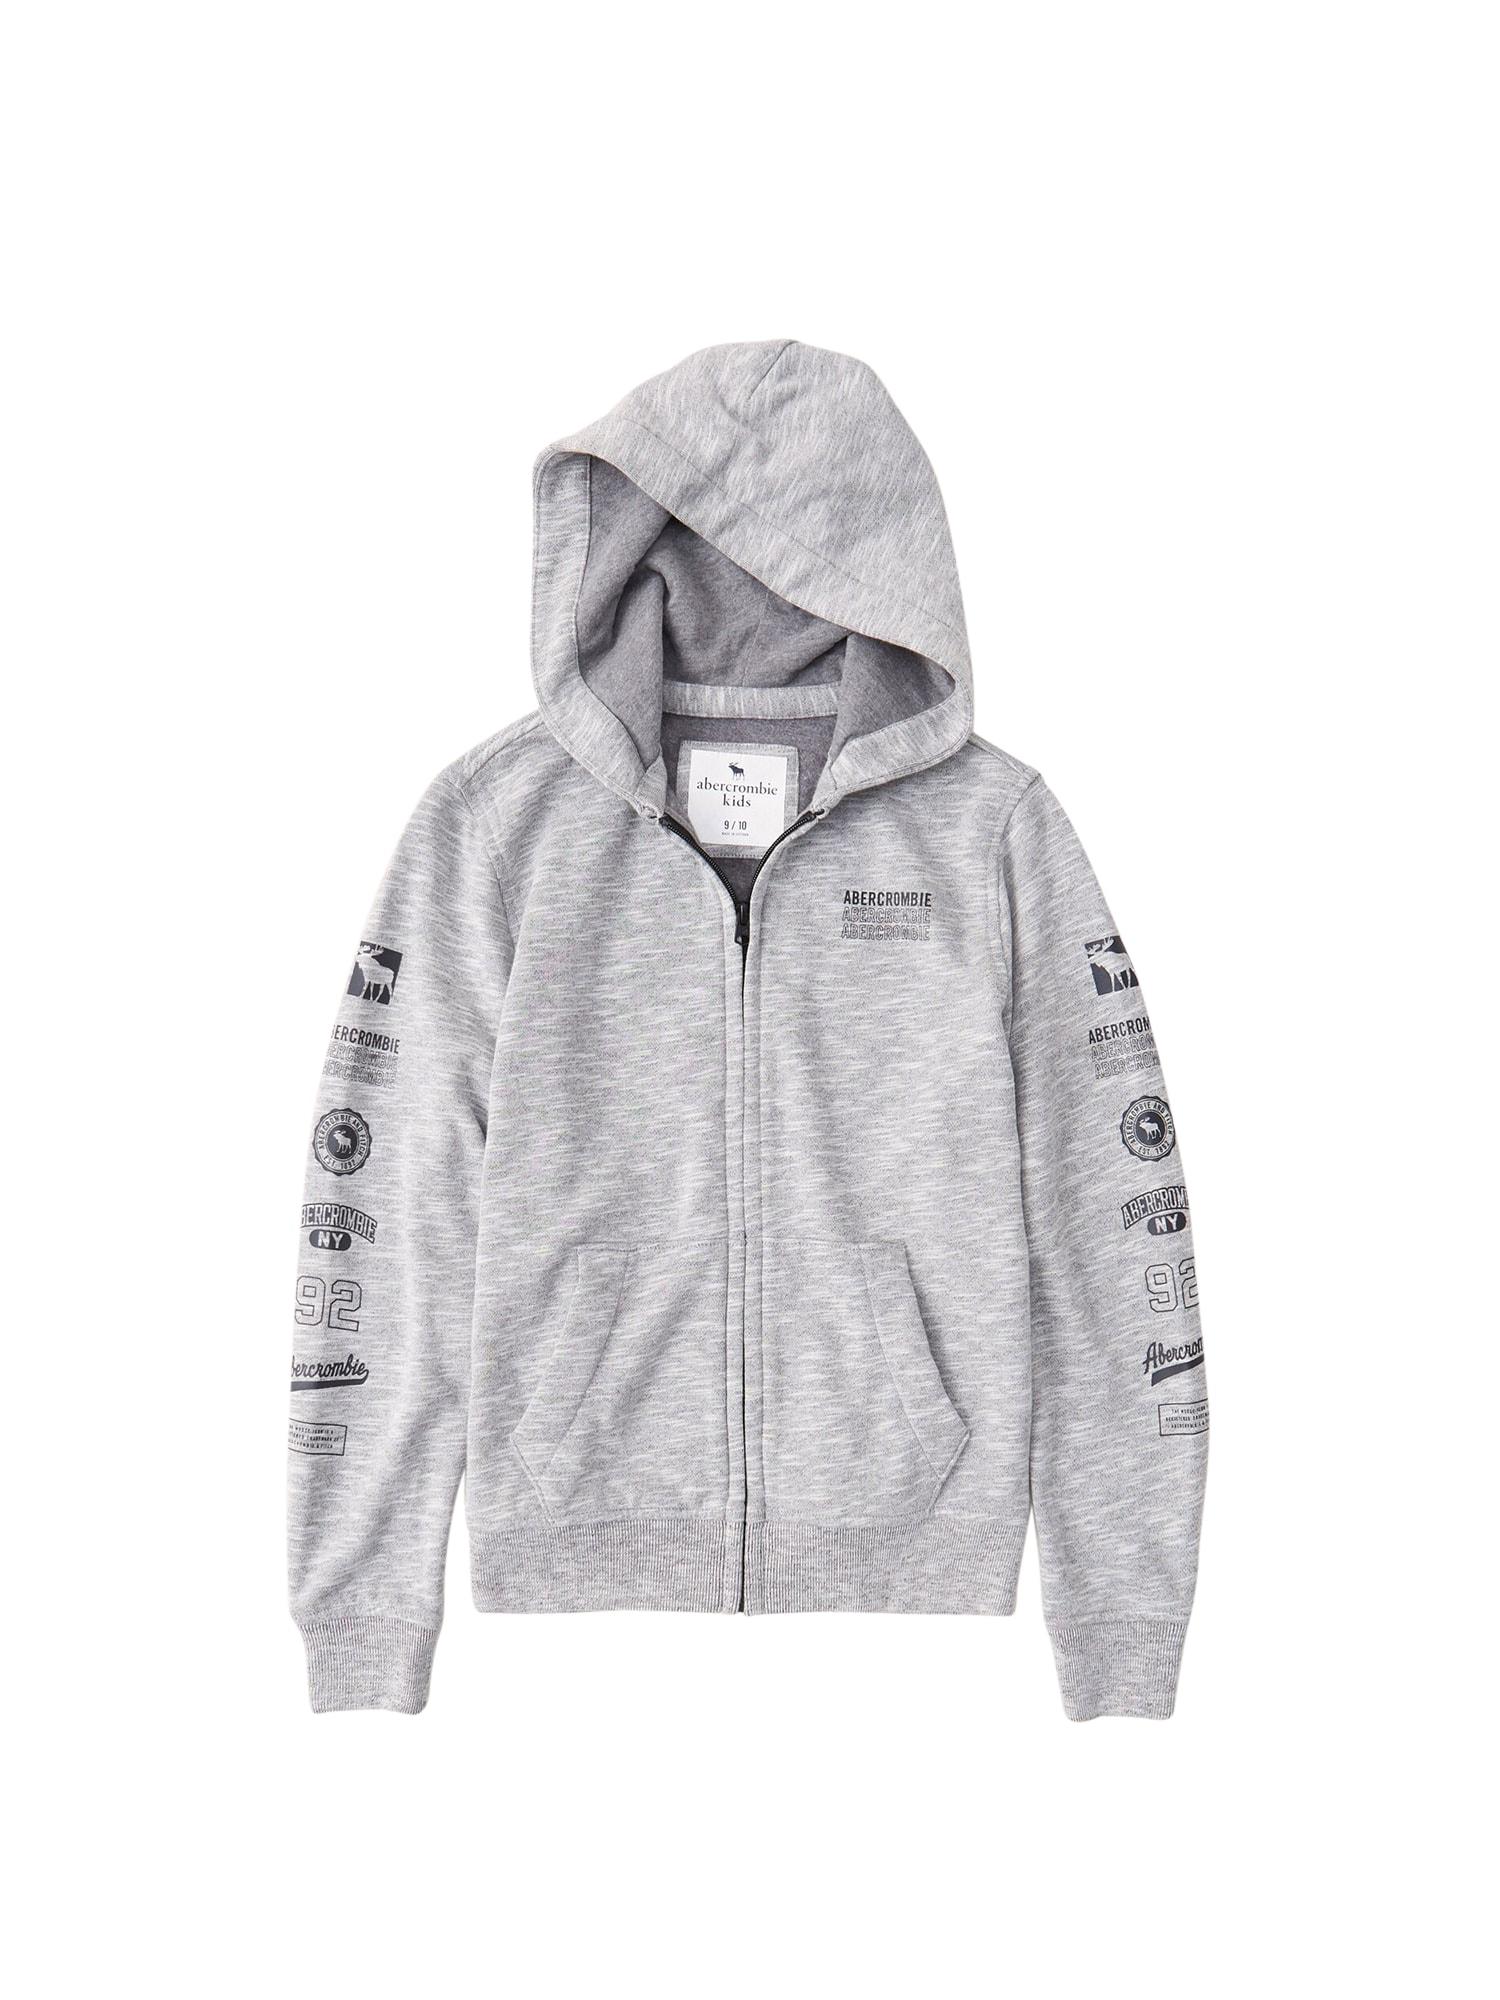 Abercrombie & Fitch Džemperis margai pilka / tamsiai pilka